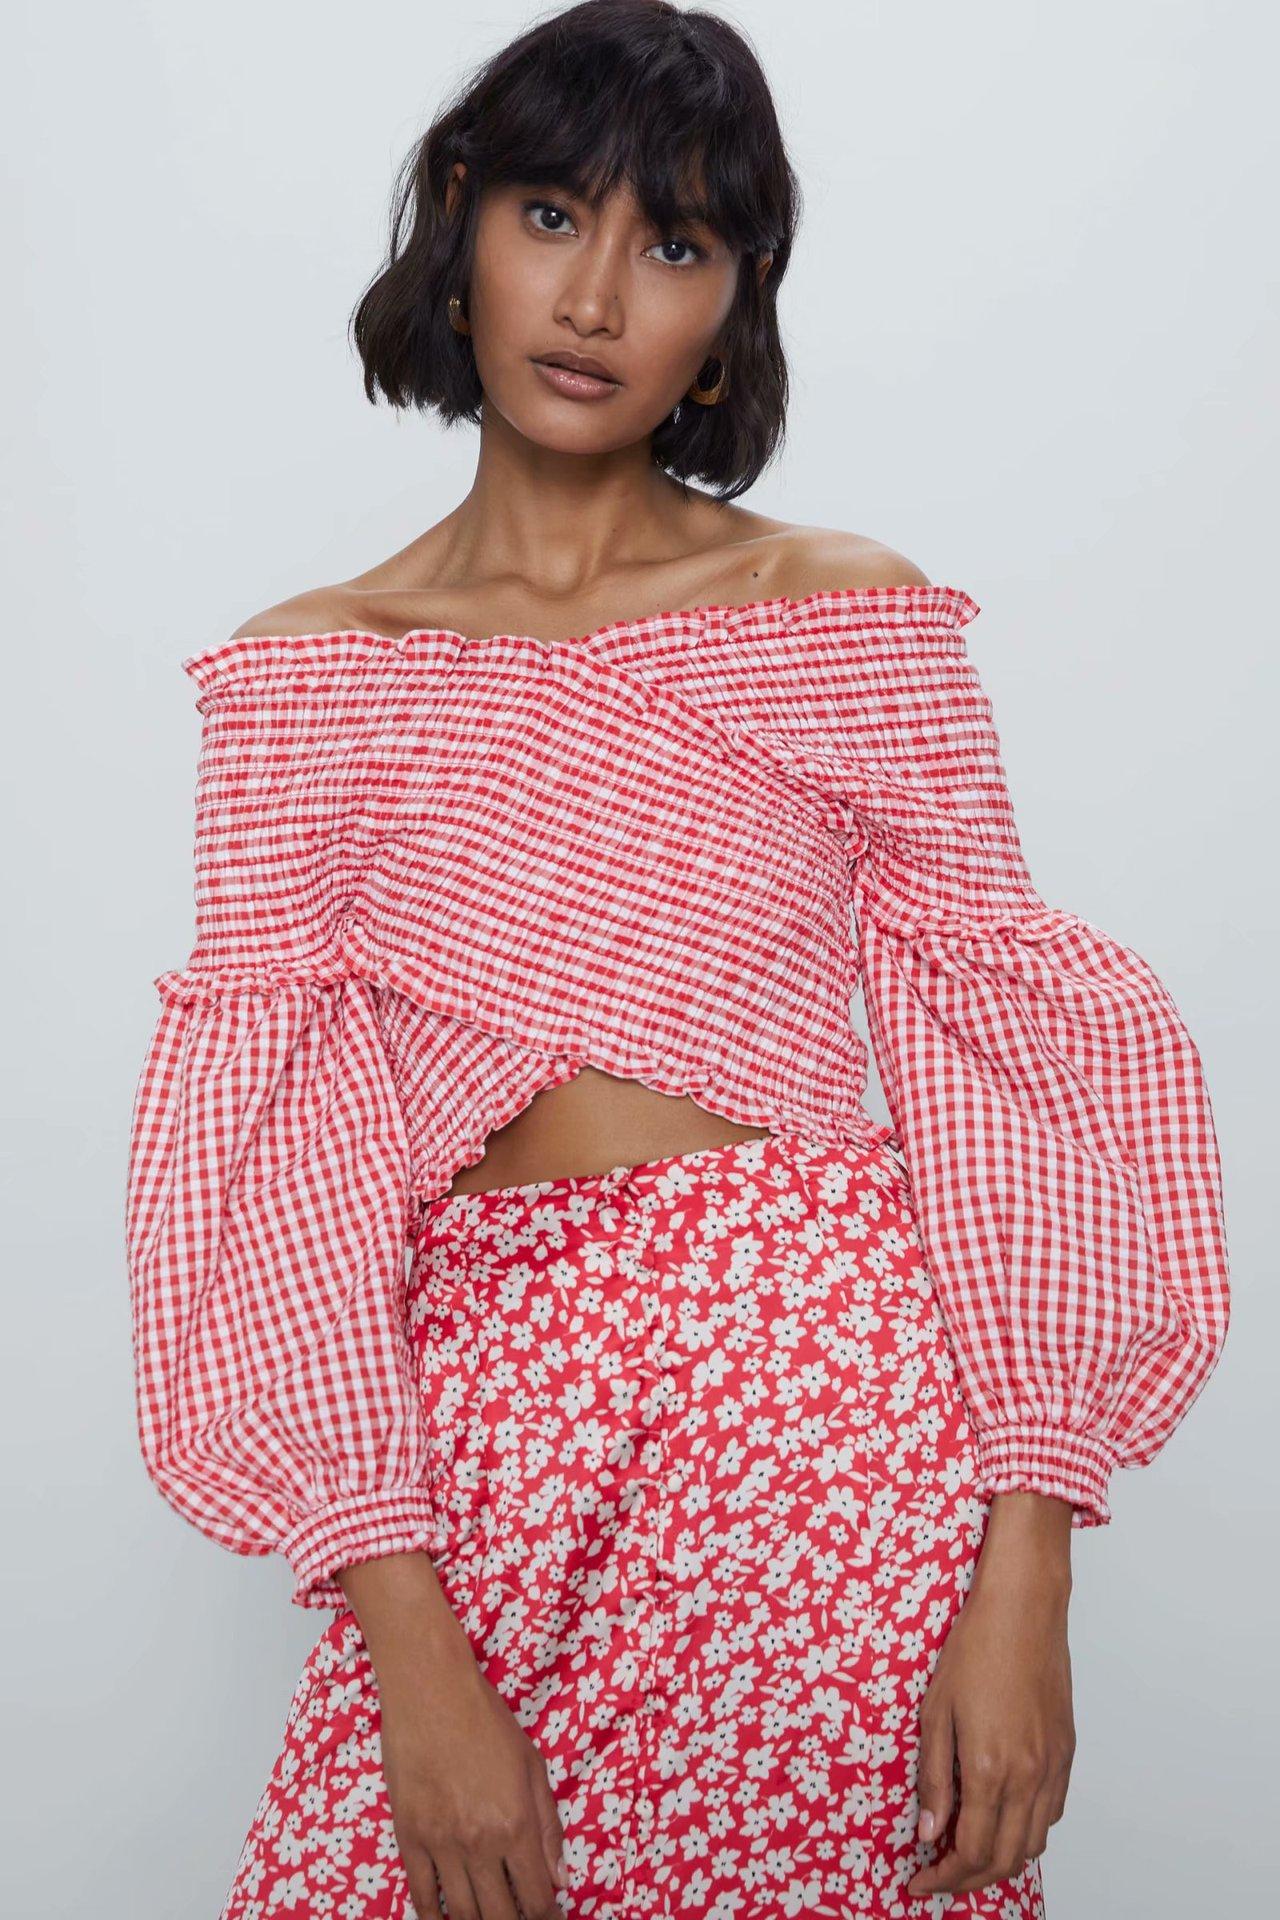 2020 New Spring Summer European Lattice Female Tops Zaraing Vadiming Sheining Women Pink Blouse Shirt Streetwear O9612